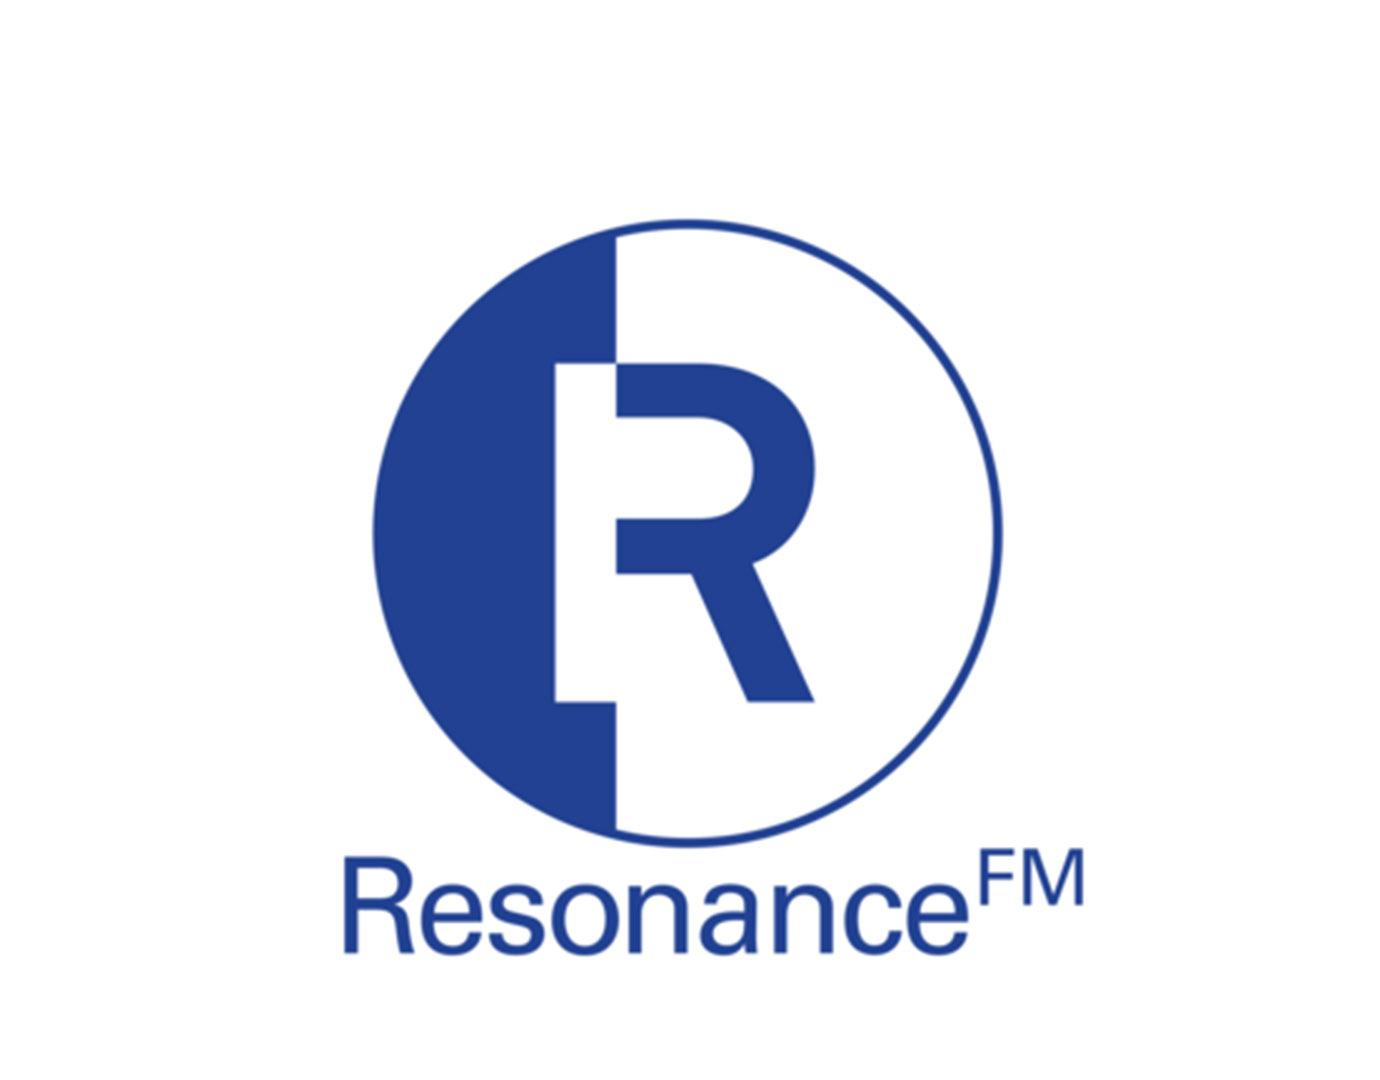 Resonance Fundraiser 2019 starts 1 February 5baa900c07